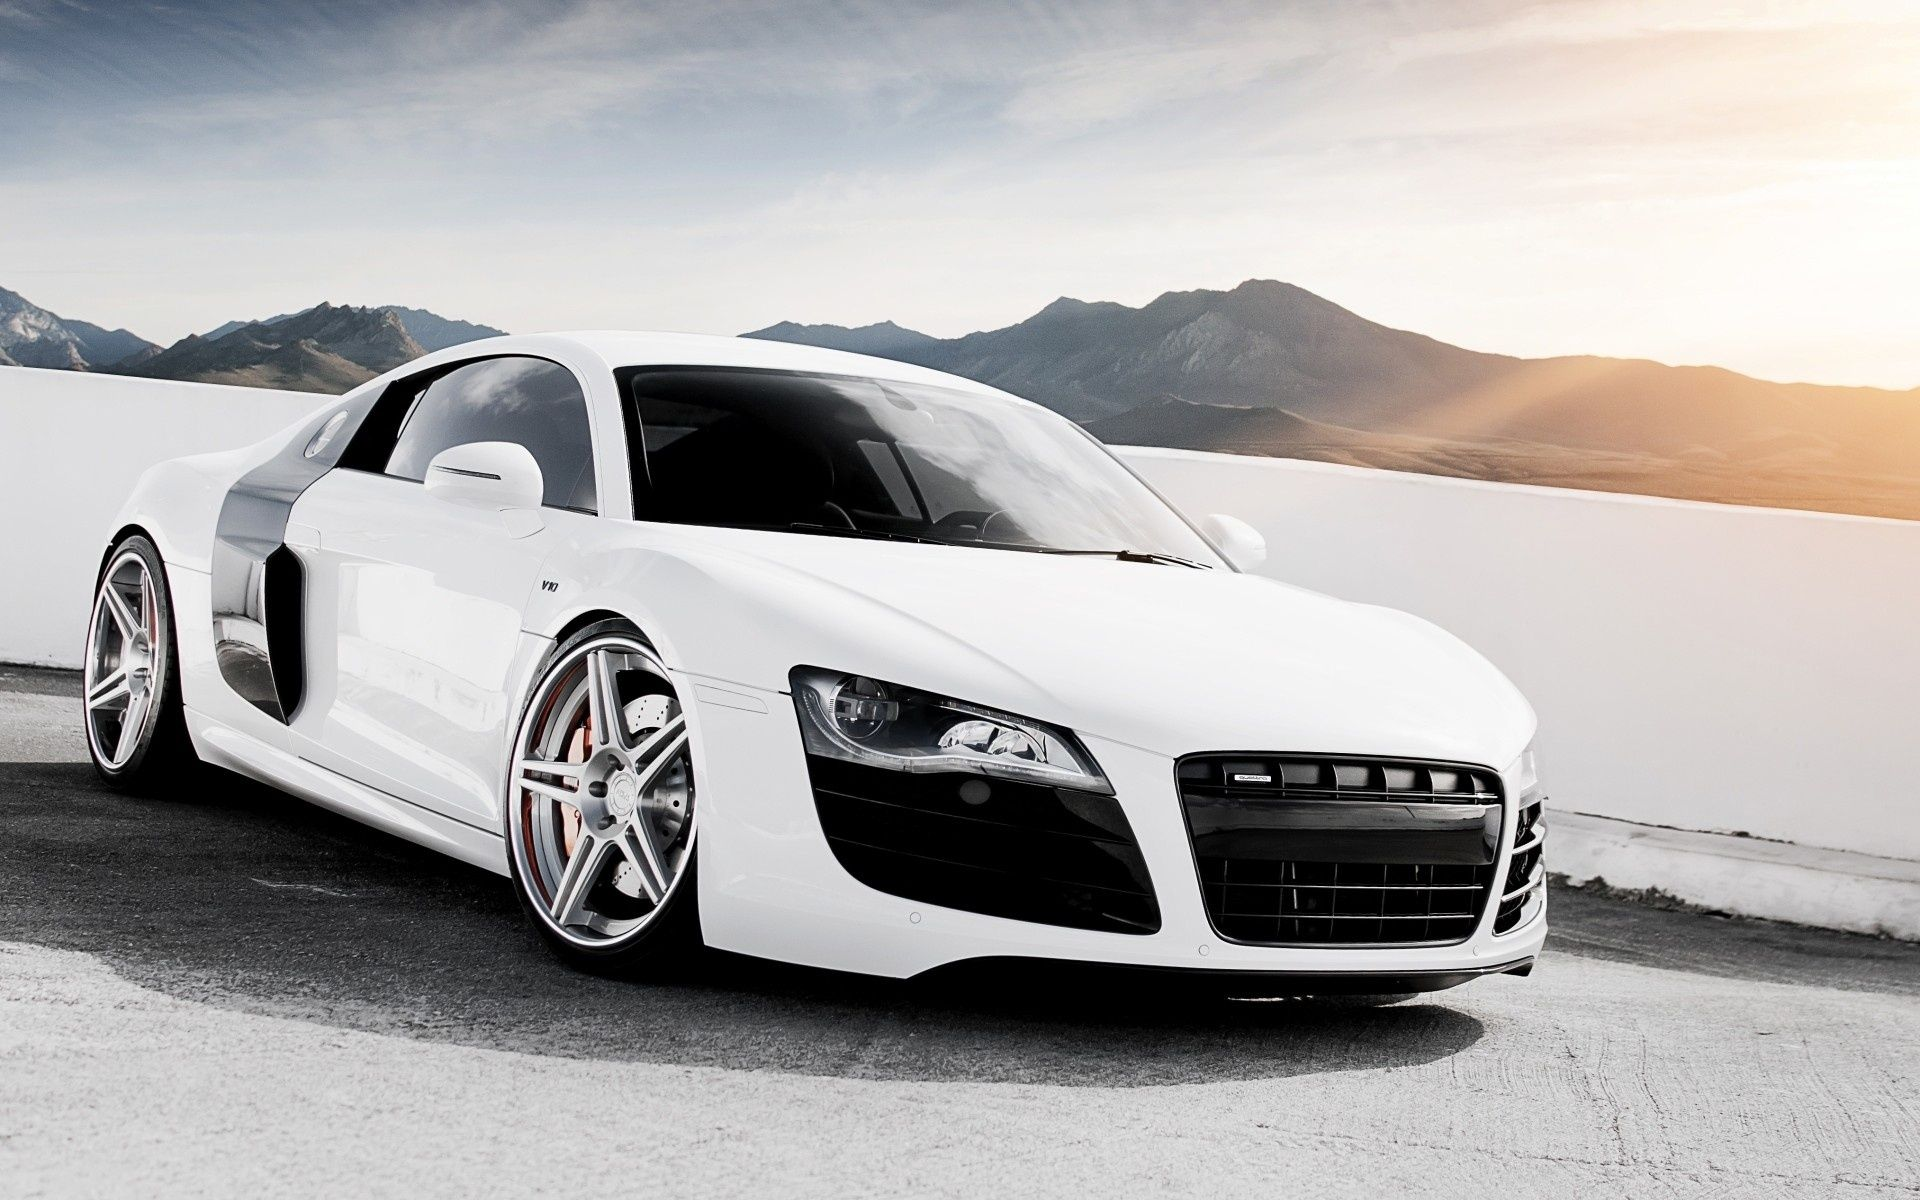 Audi R8 Advert Audi Sports Car Audi R8 Audi Cars